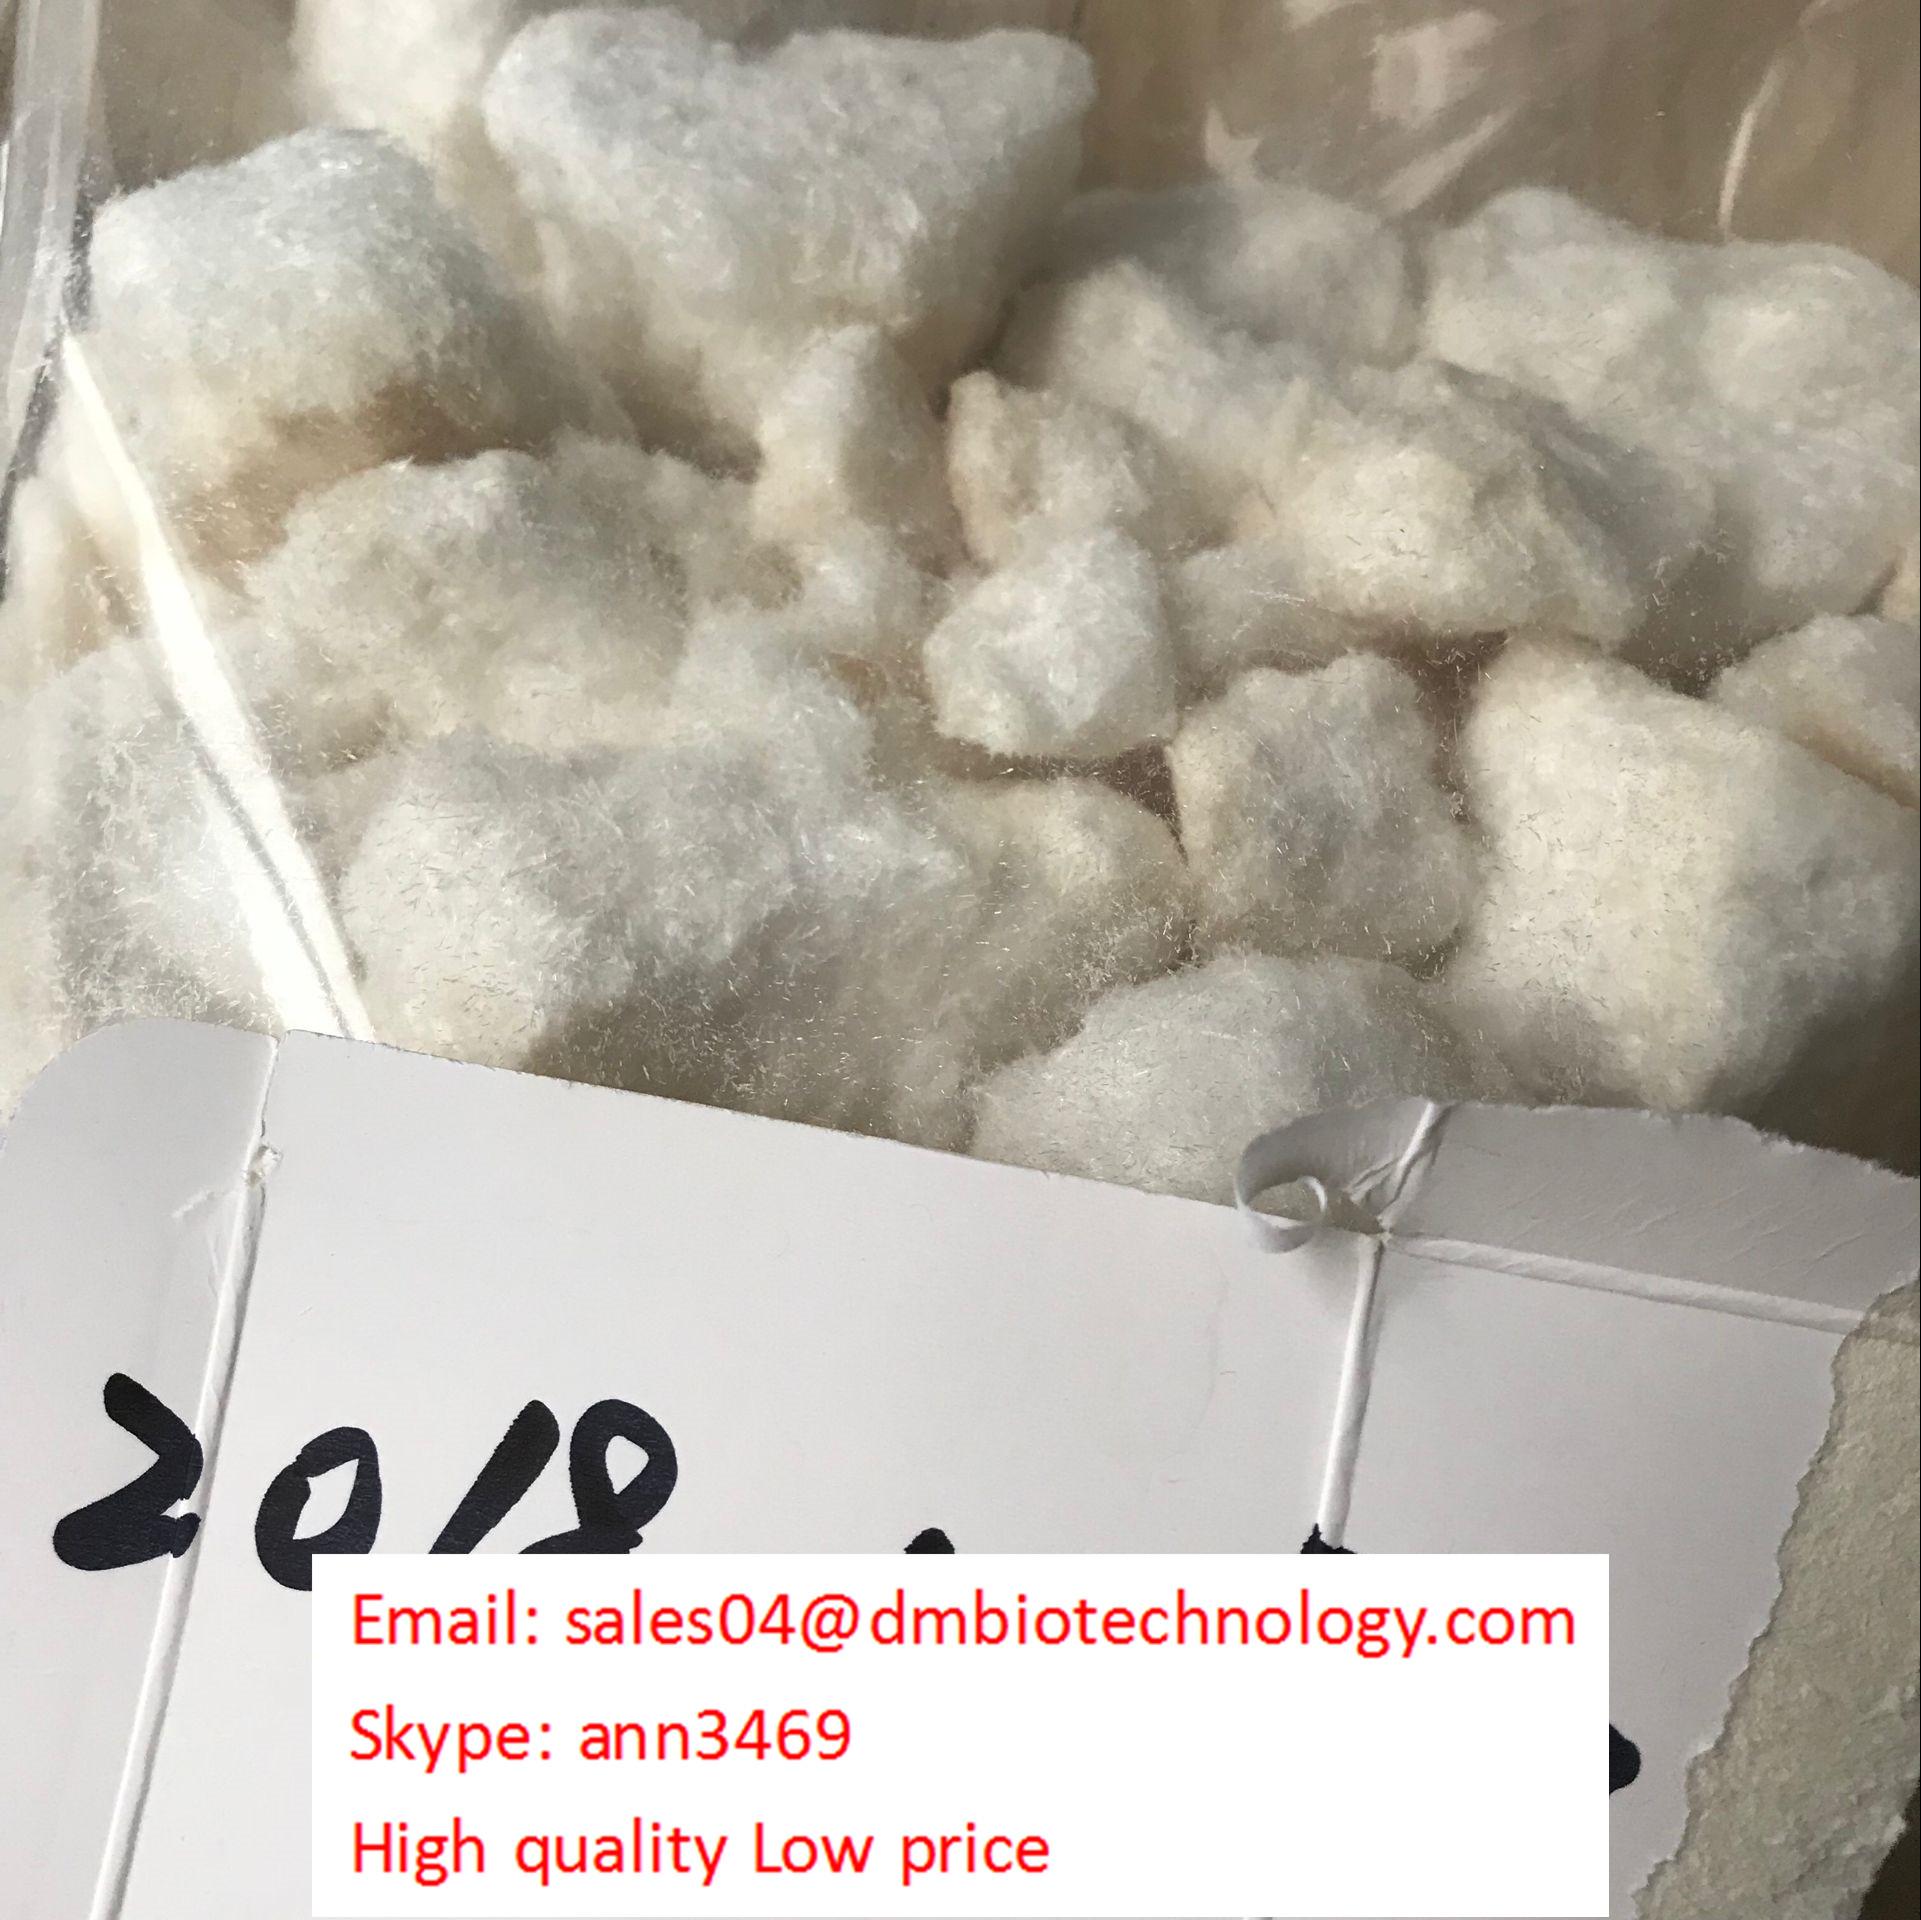 Big Crystal APV Research Chemical 4 - Methyl - PHP ALPHA PHP APVT